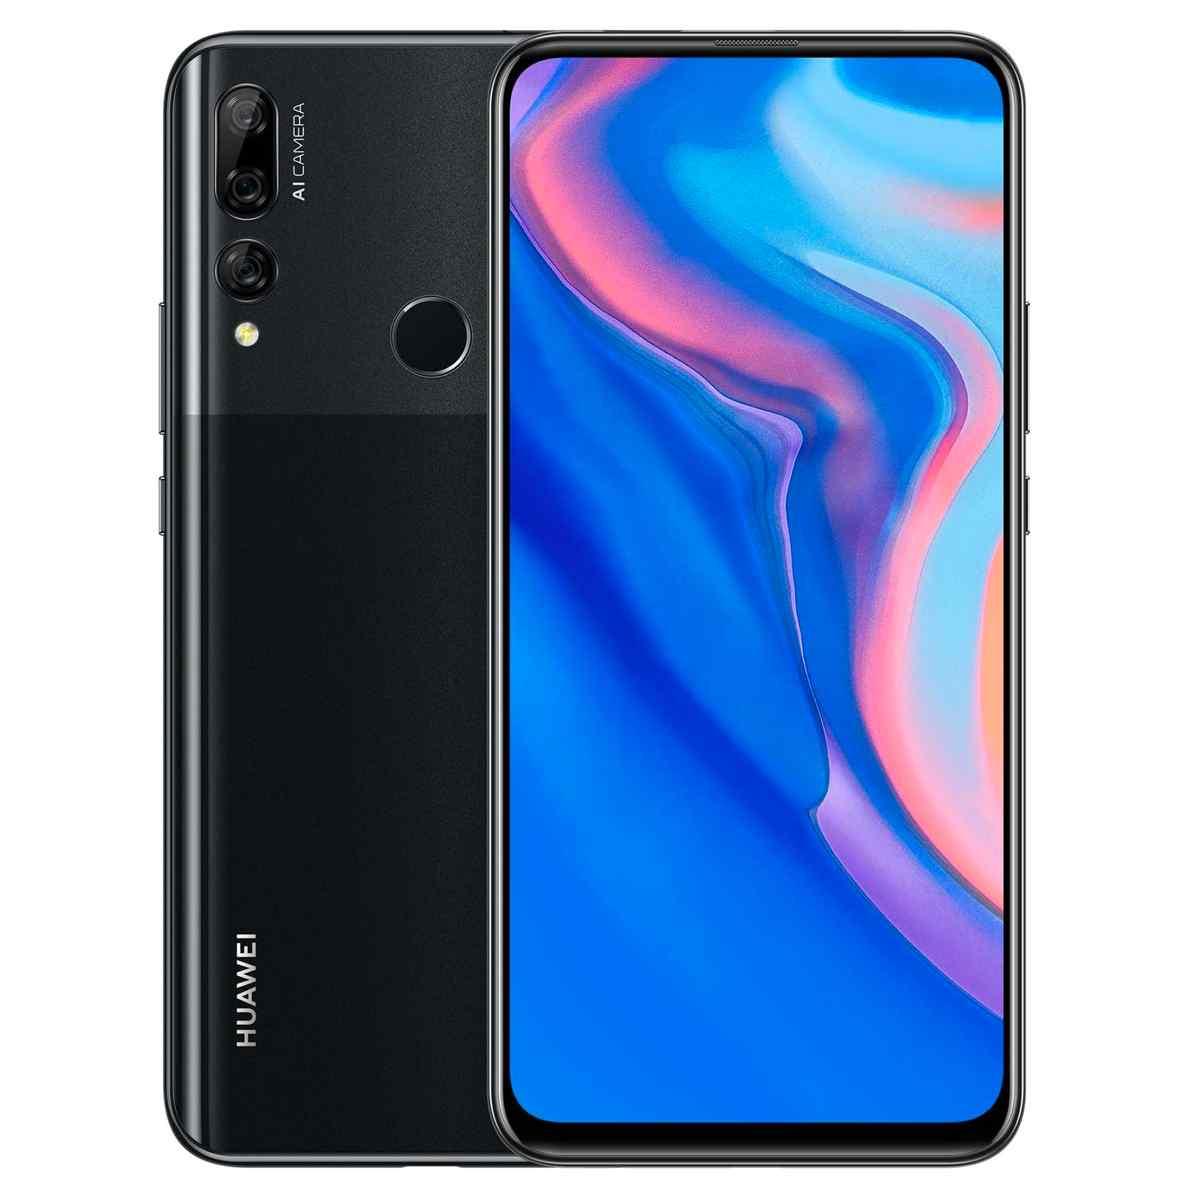 Huawei Y9 Prime 2019 Price In Pakistan 2021 Priceoye Huawei matebook x pro 2020. huawei y9 prime 2019